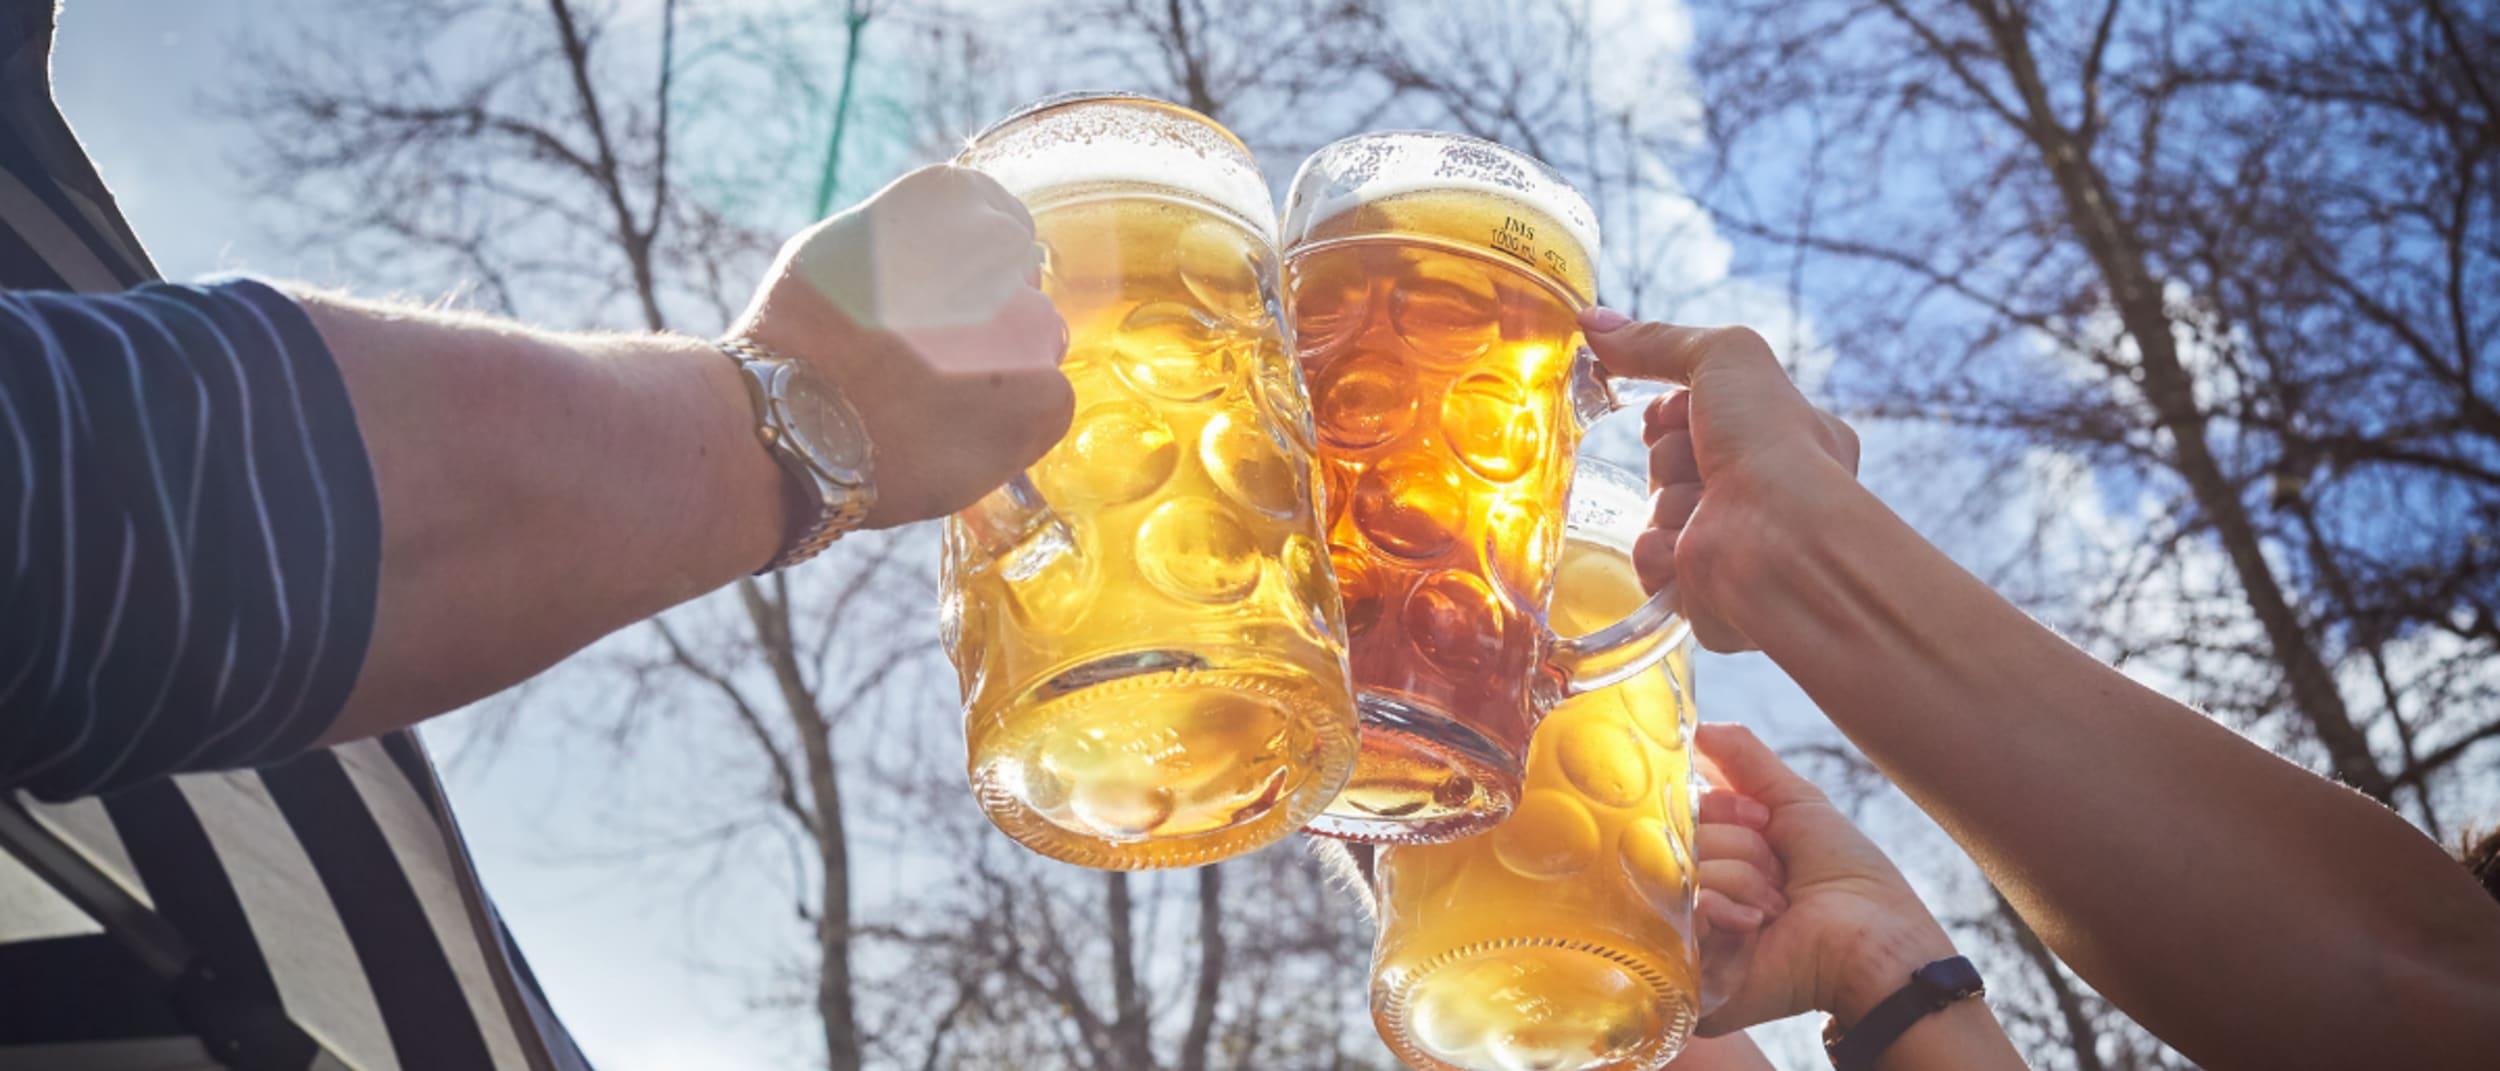 The Bavarian: Wednesday night trivia